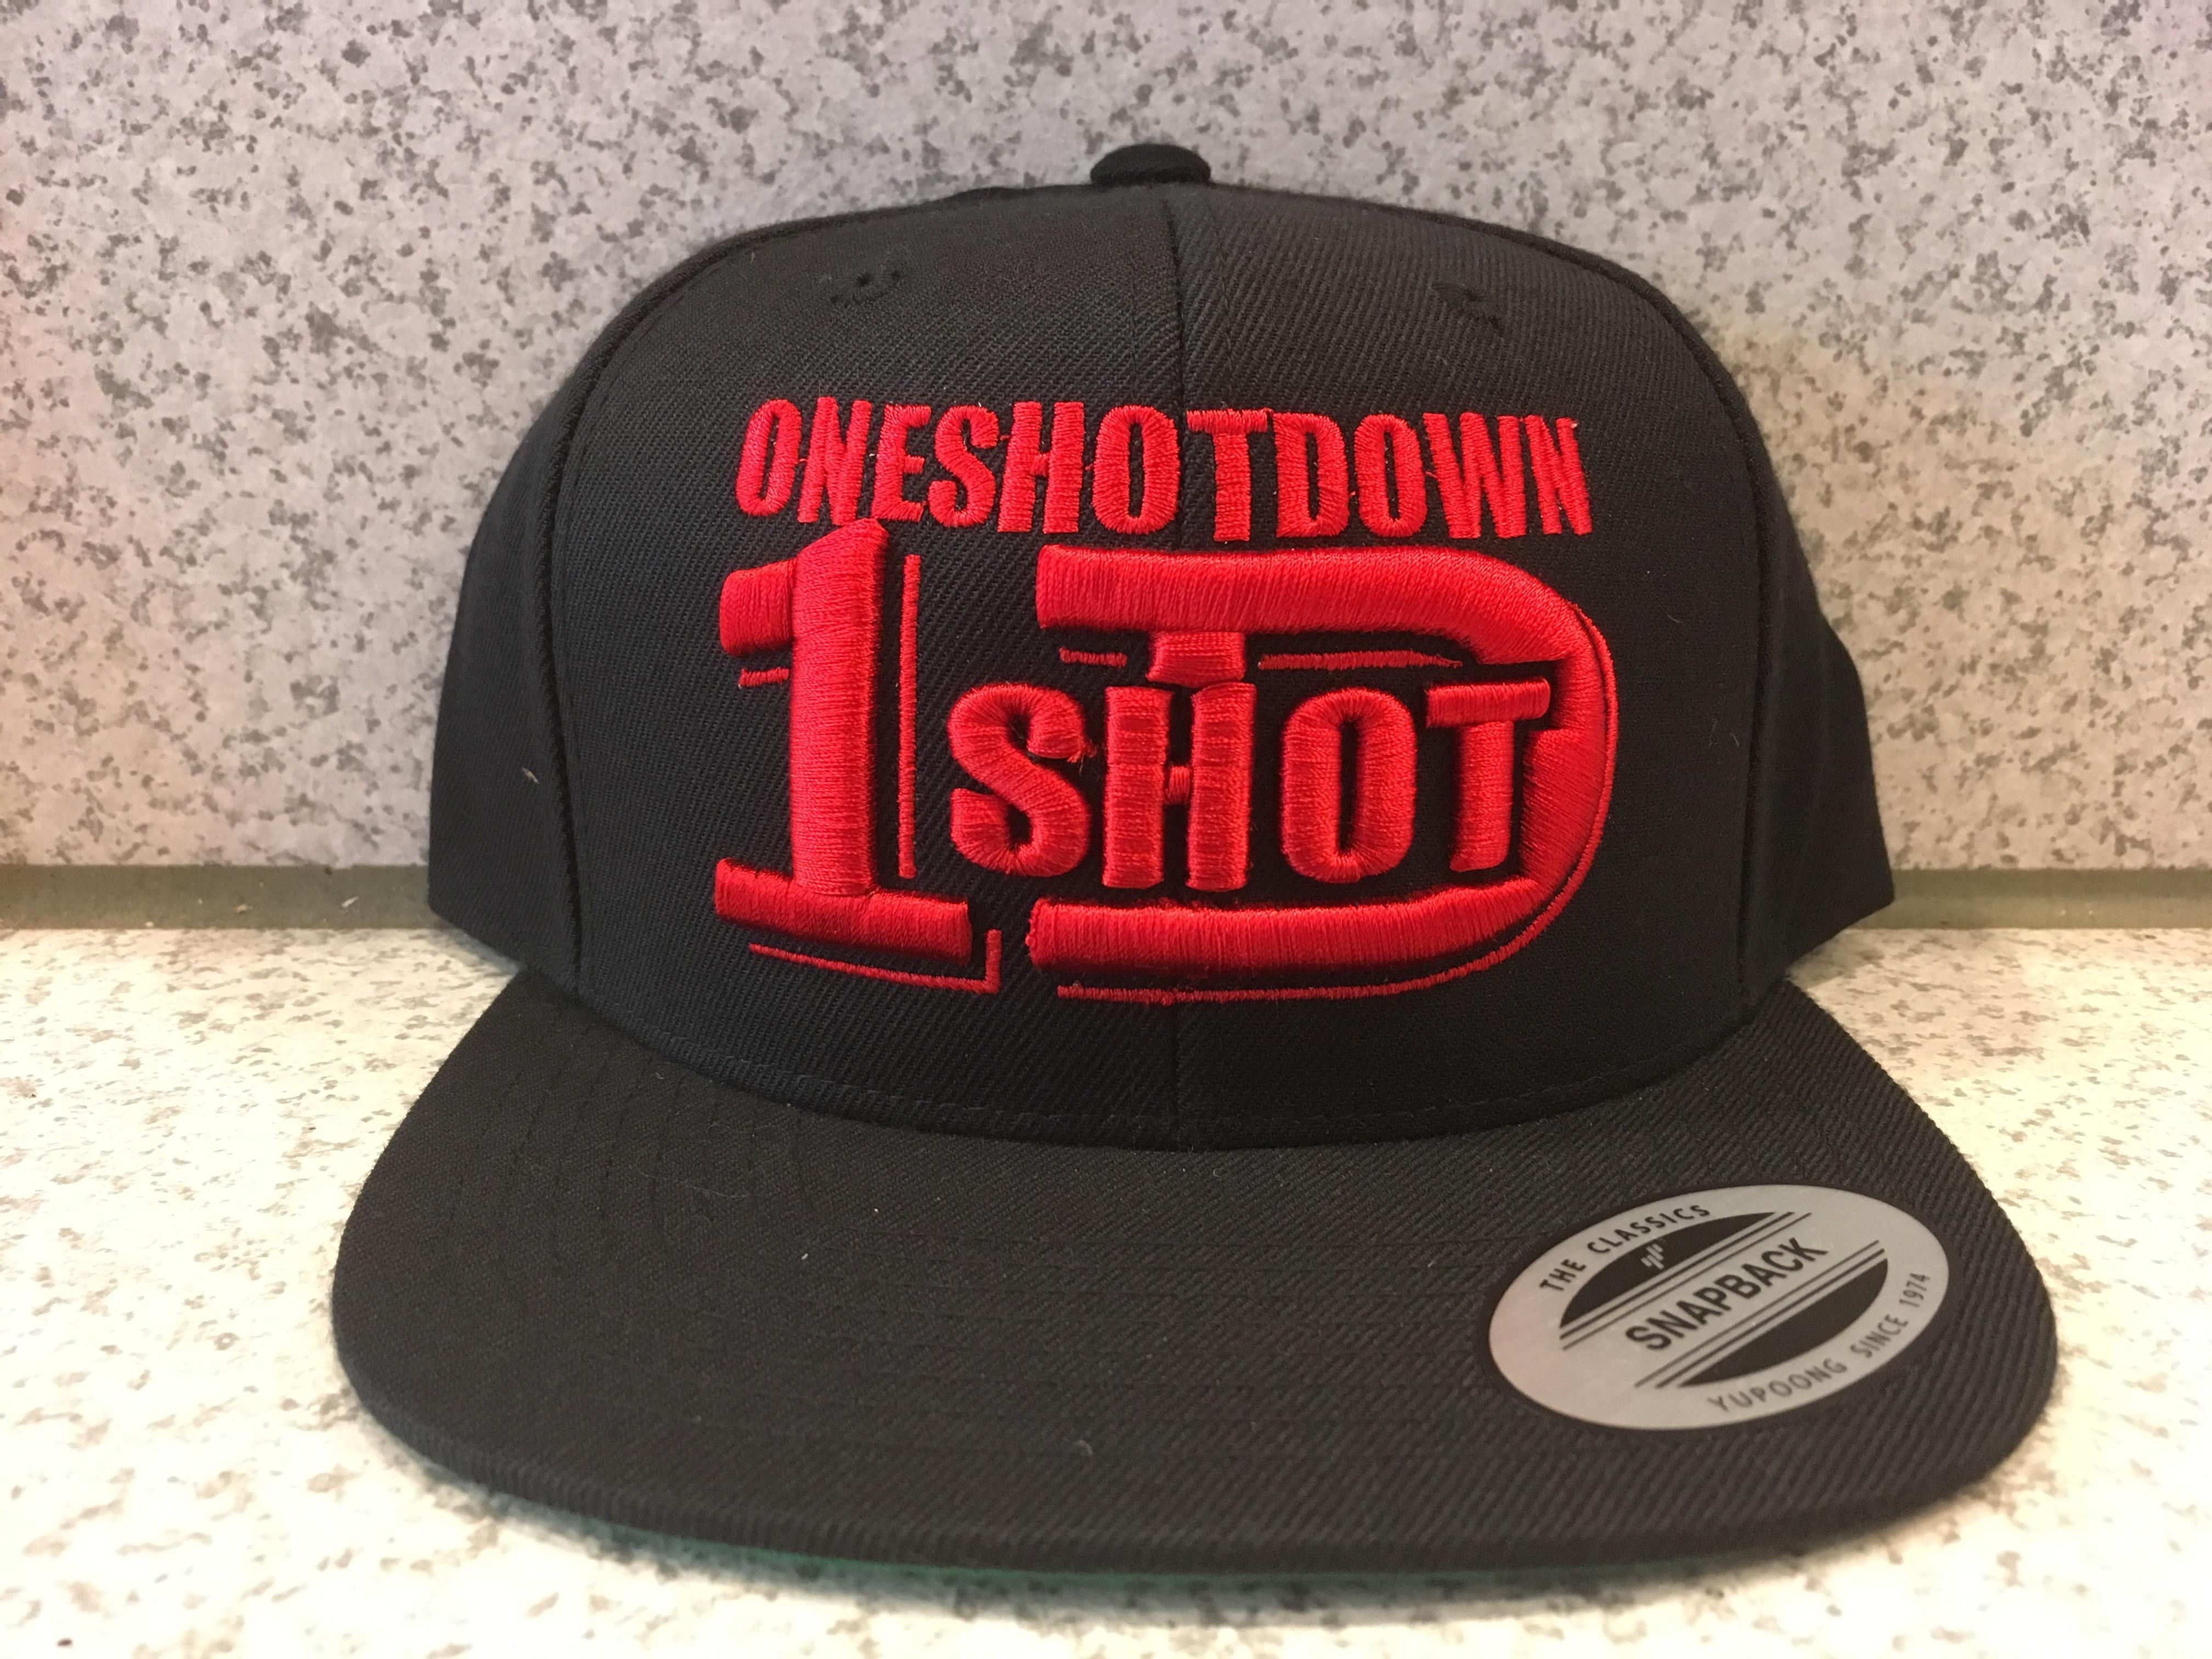 ONESHOTDOWNロゴ3D刺繍CAP - 画像4